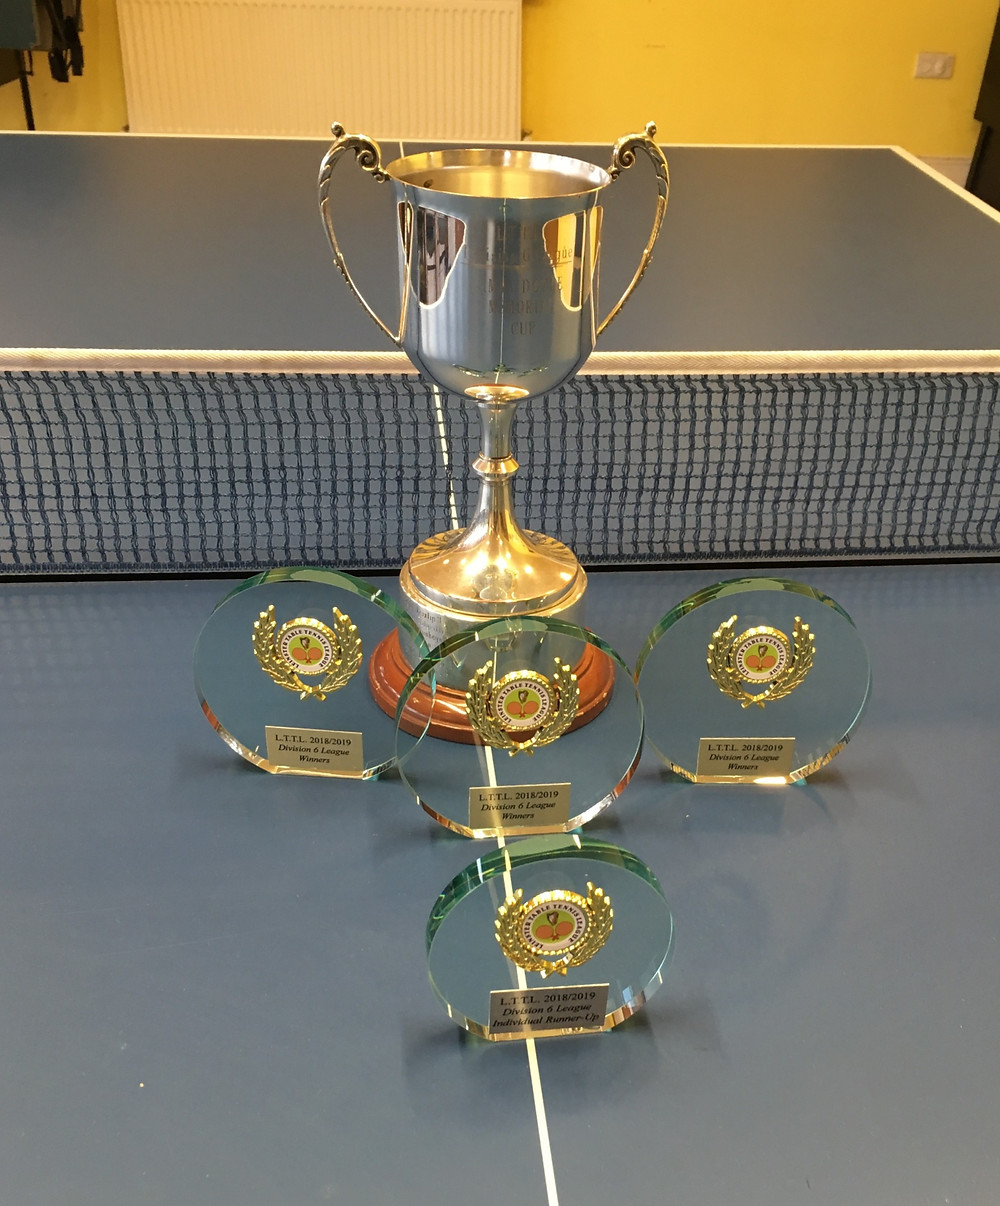 Dunboyne Table Tennis Trophies